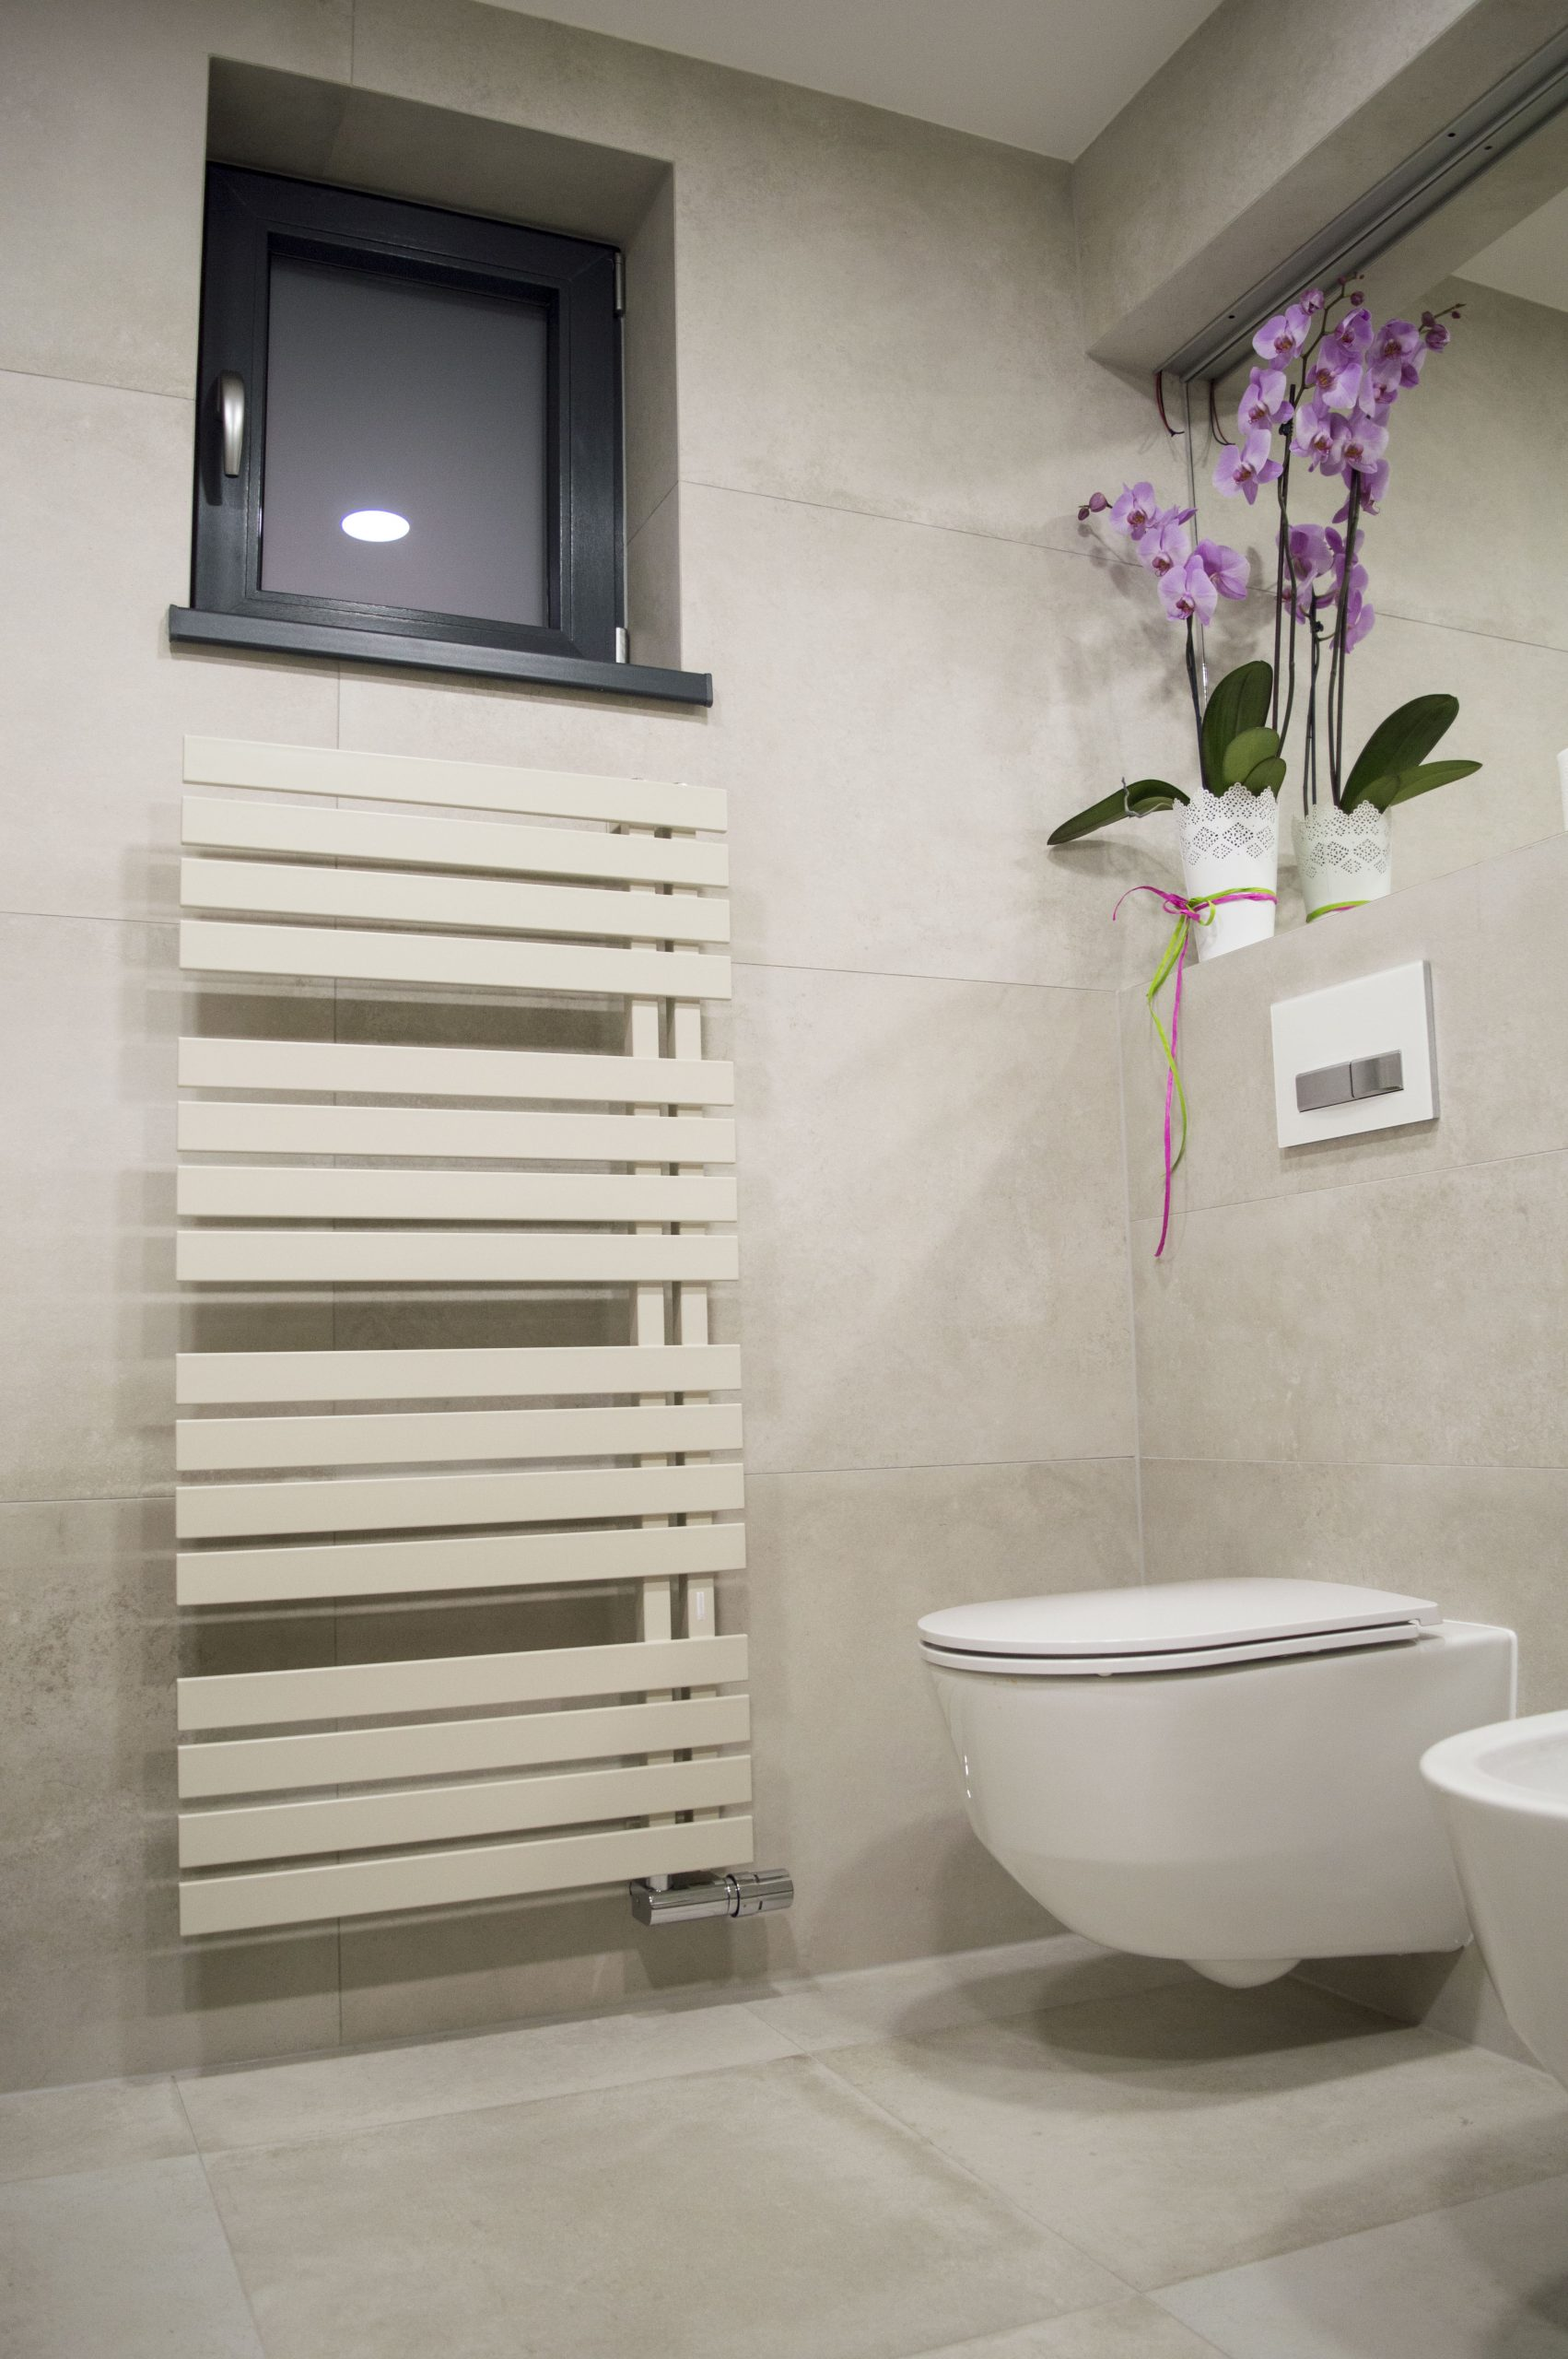 Kúpeľňový radiátor FLORIDA | LOTOSAN Kúpeľne a interiér